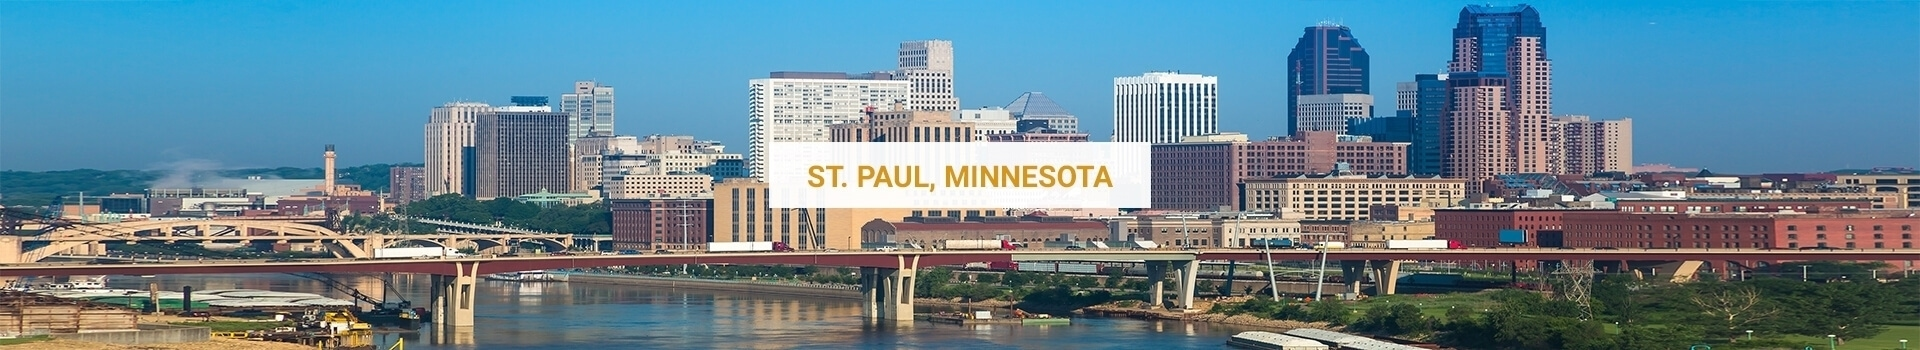 St_Paul Minnesota